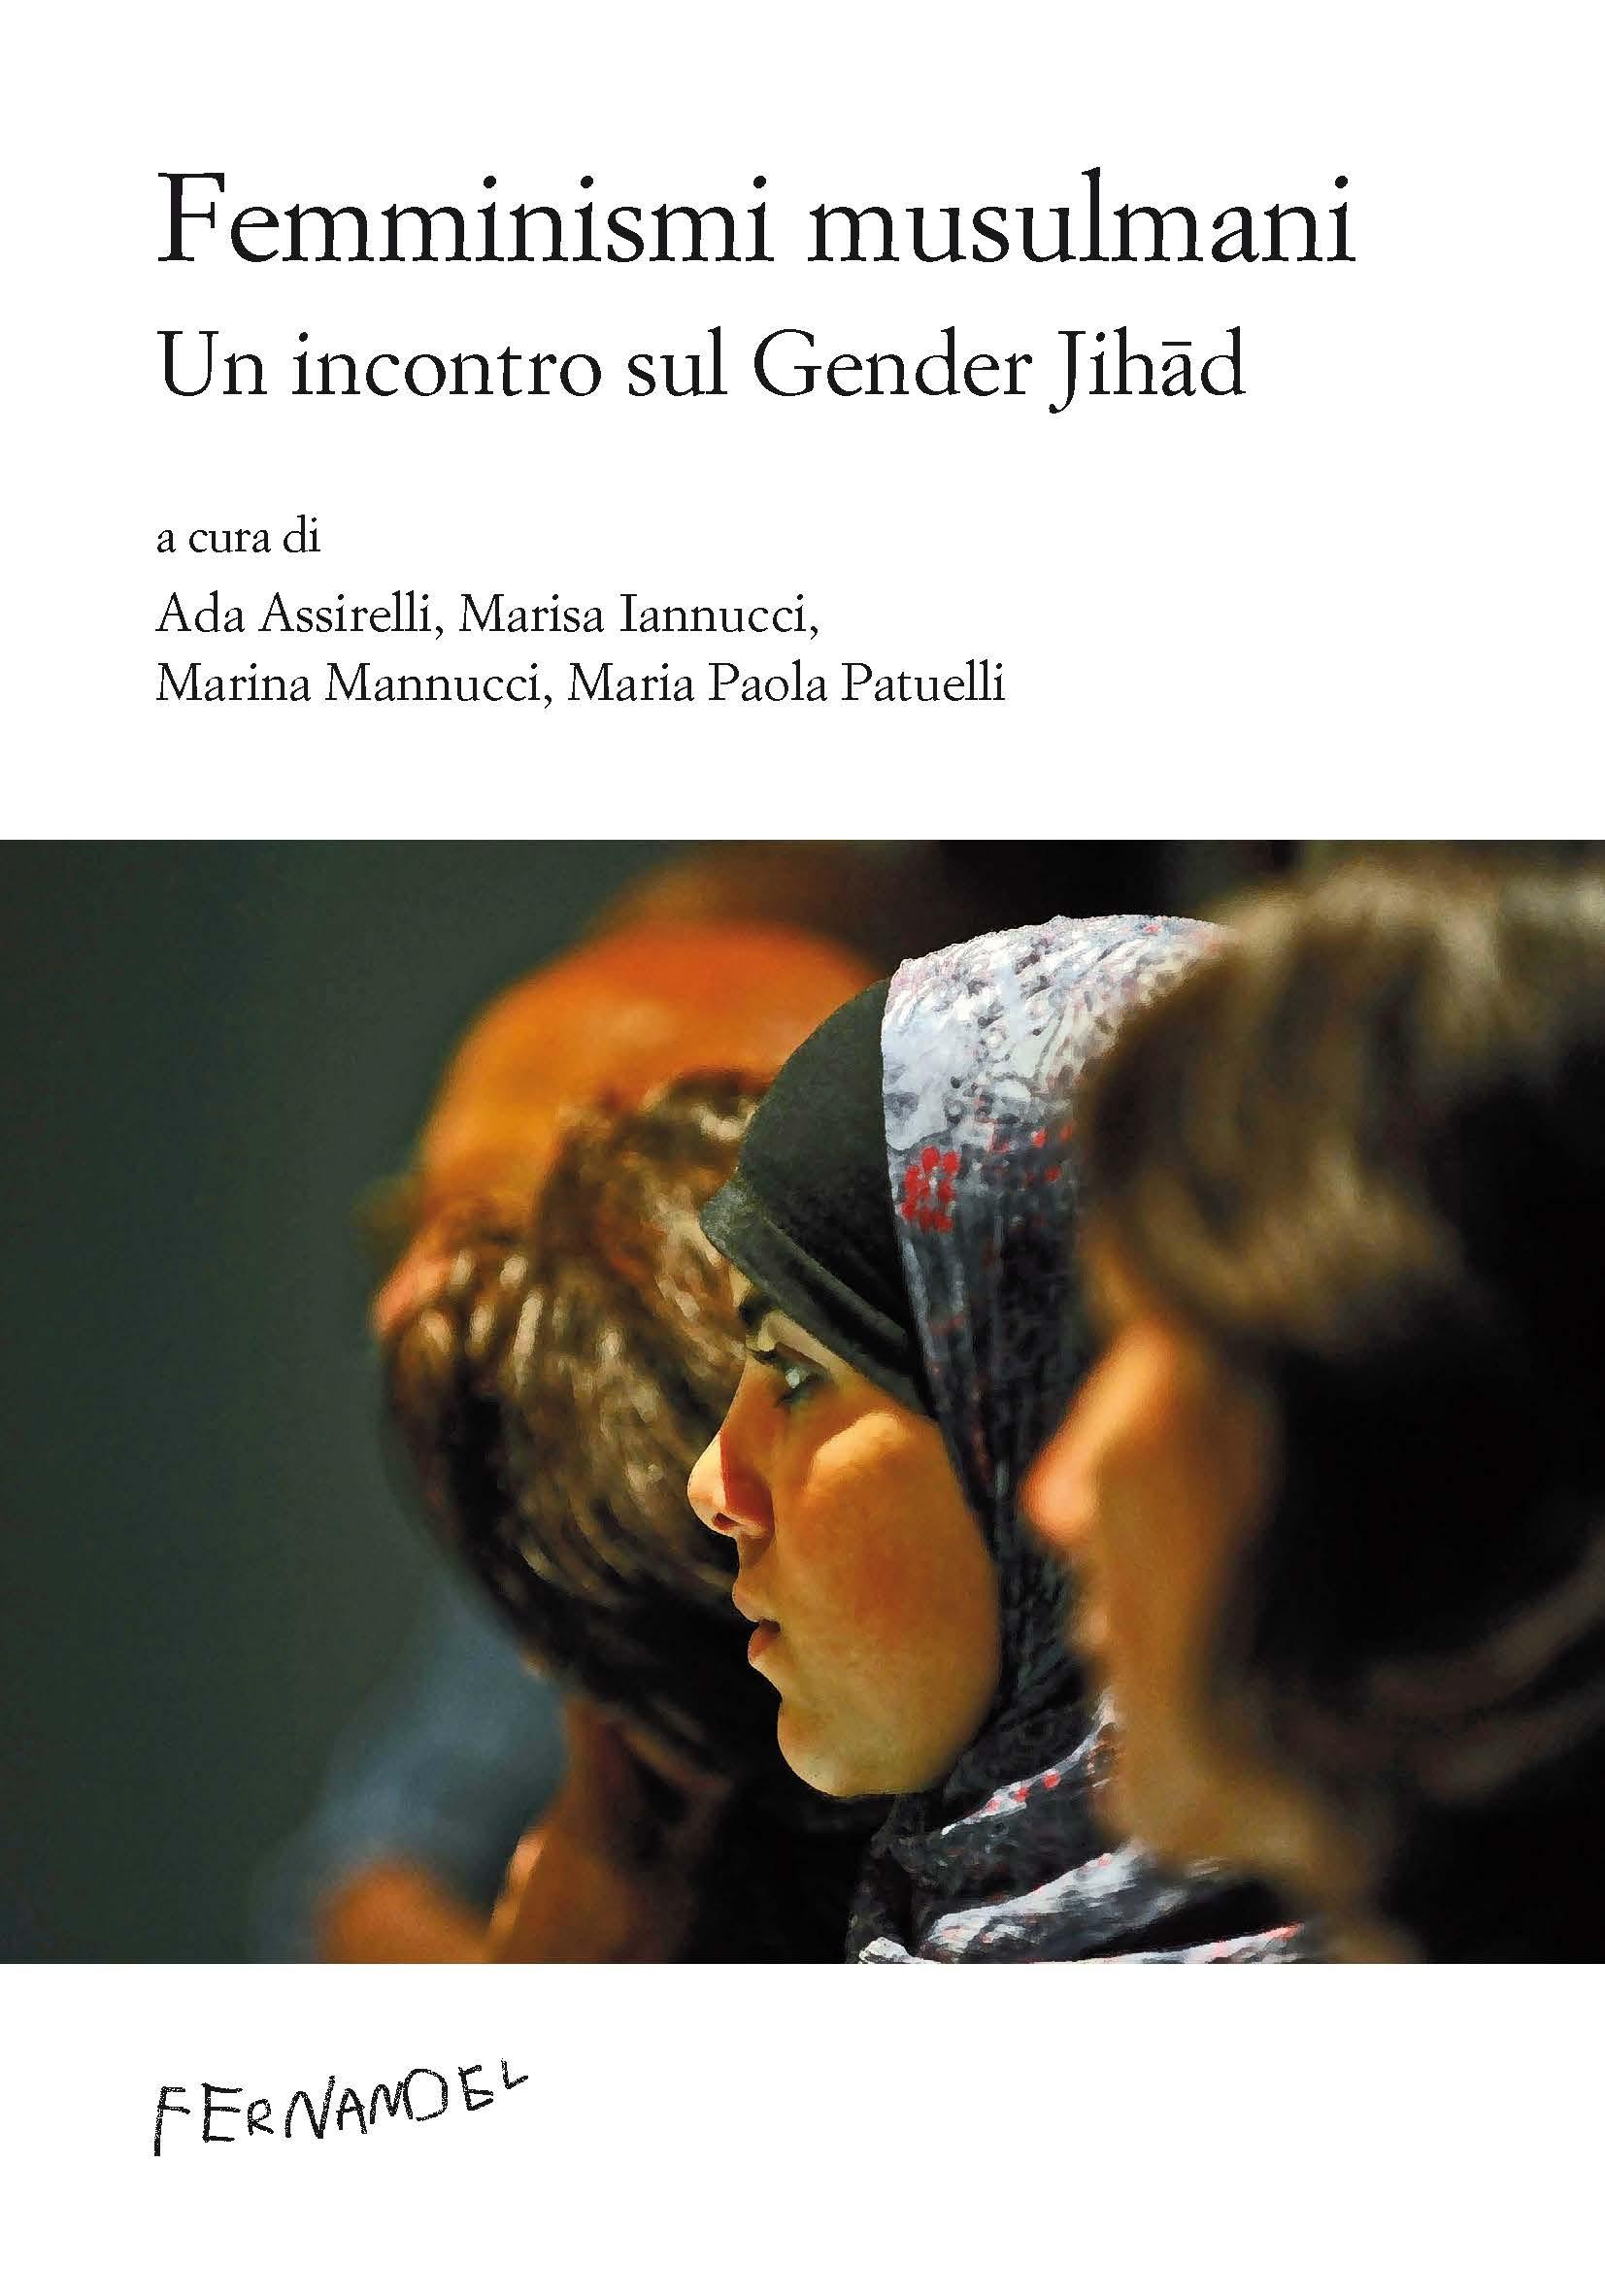 Femminismi musulmani